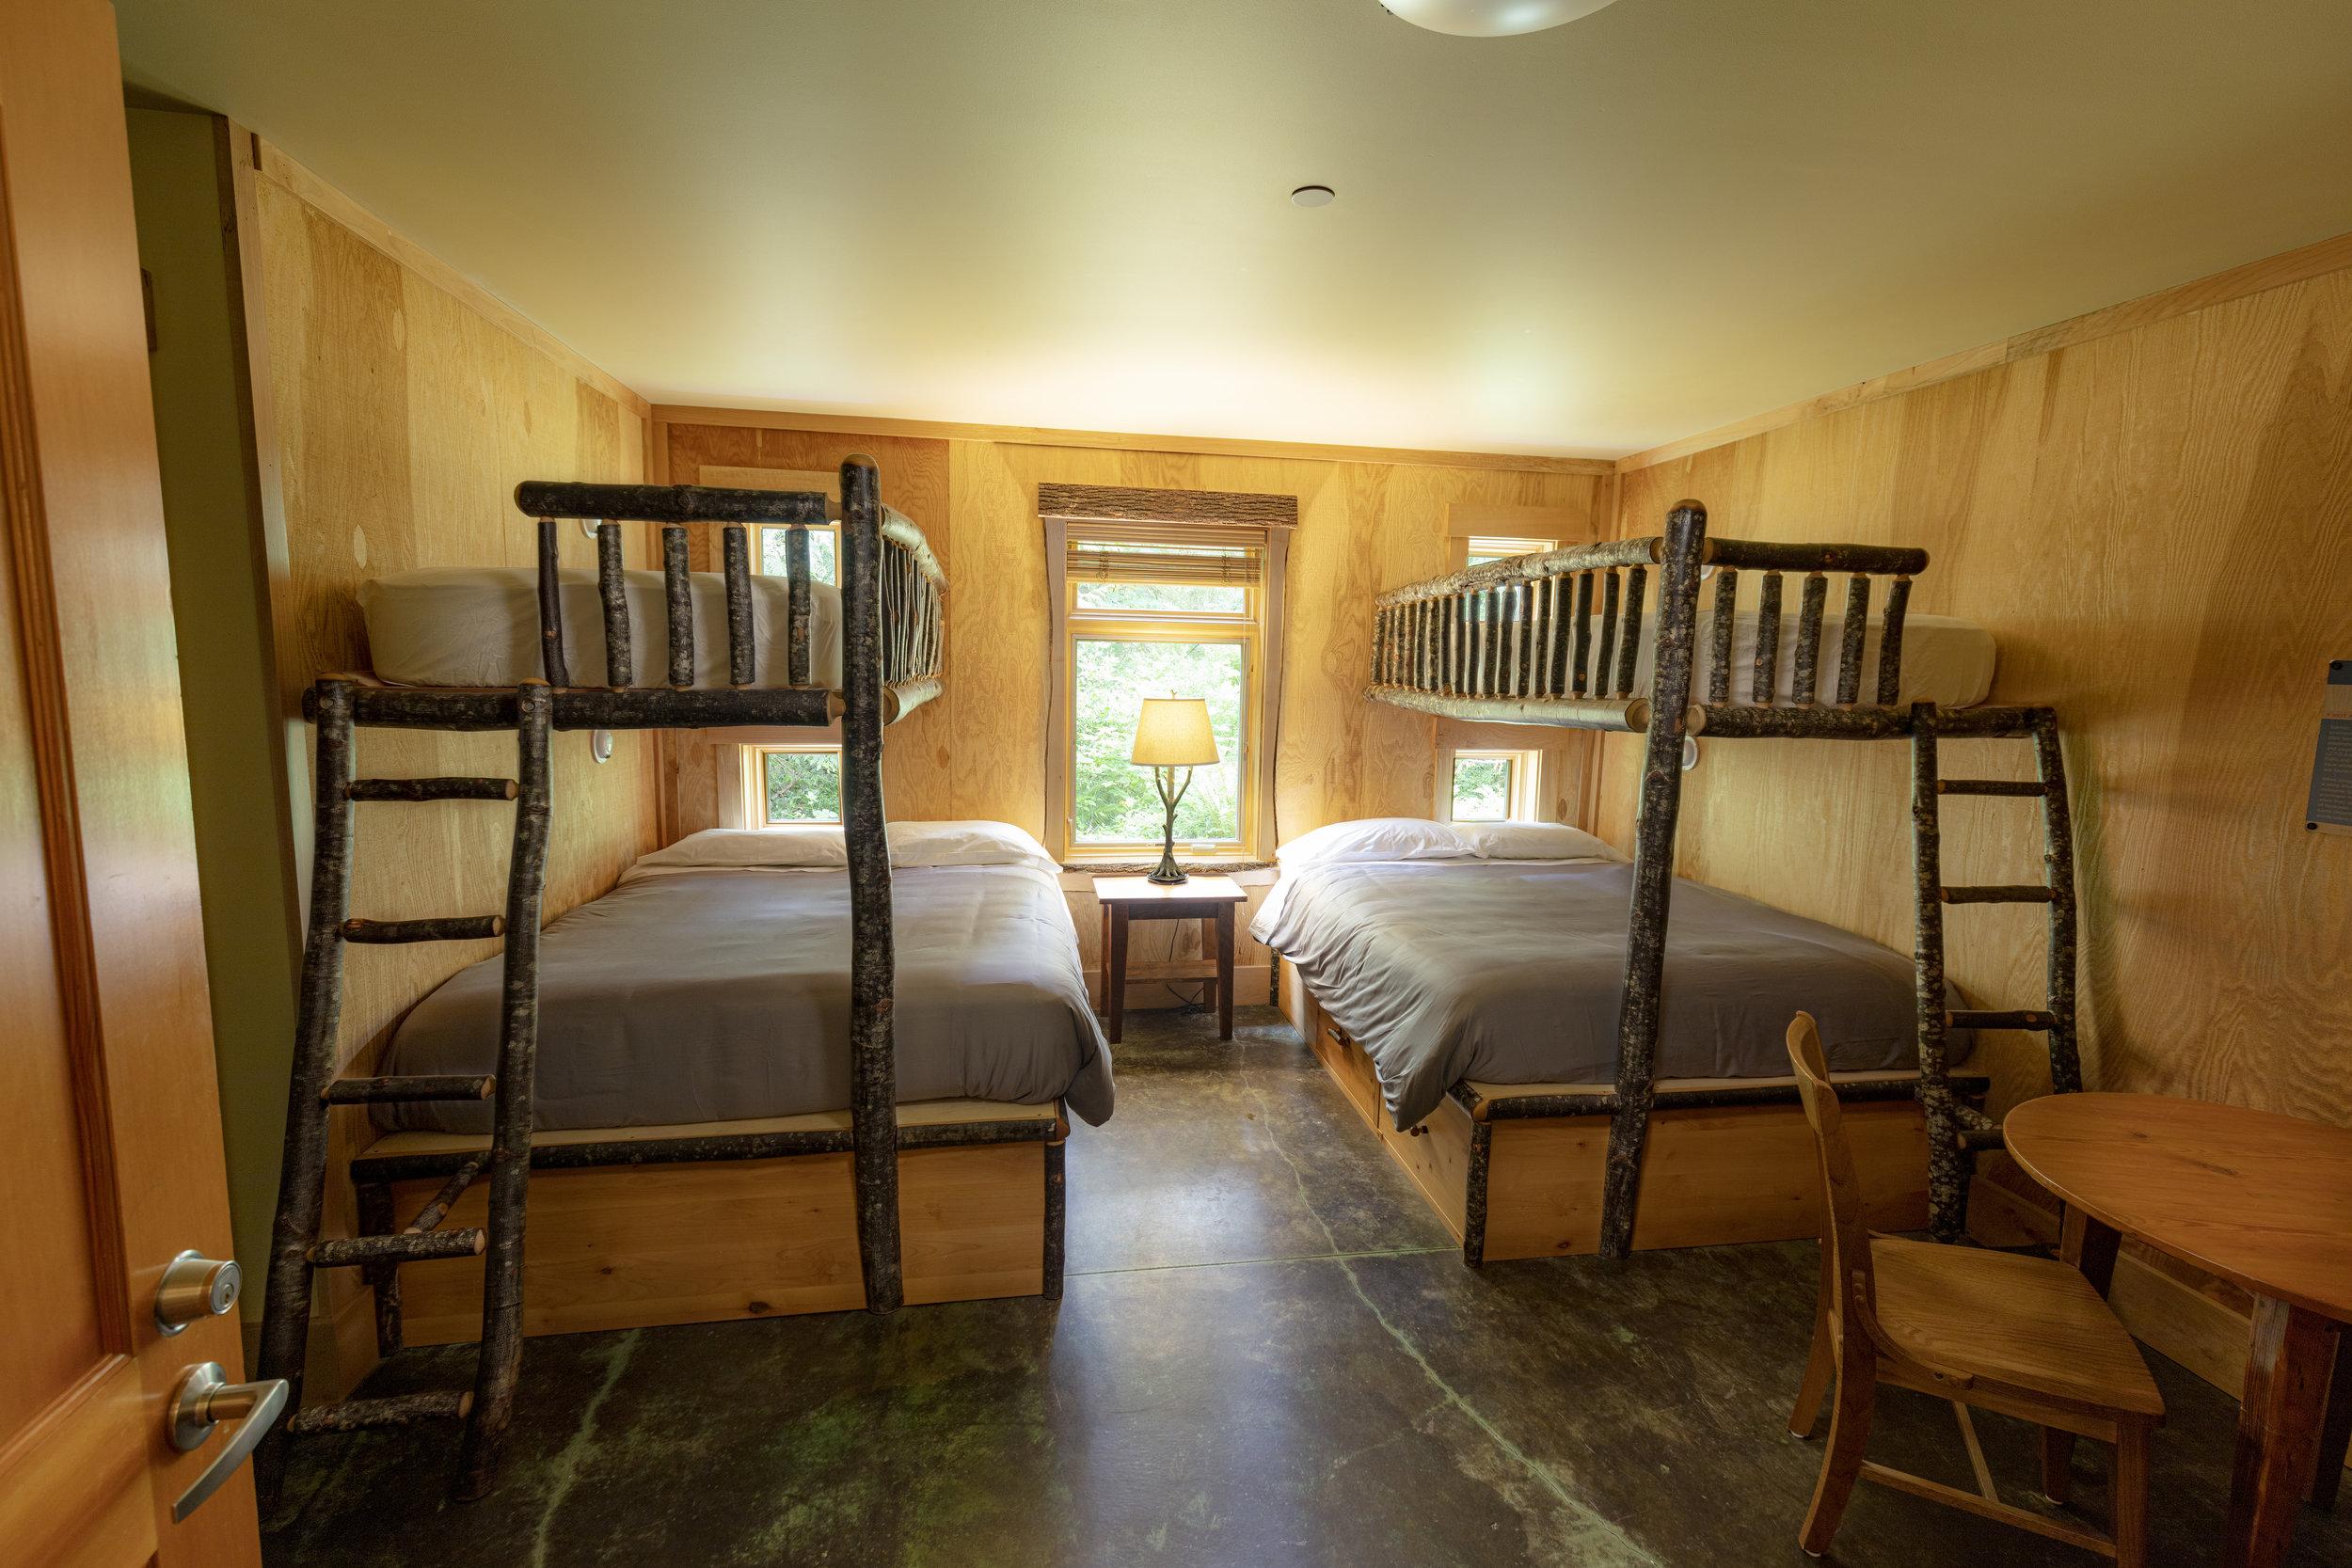 Ichthyology Lodge Bedroom.jpg